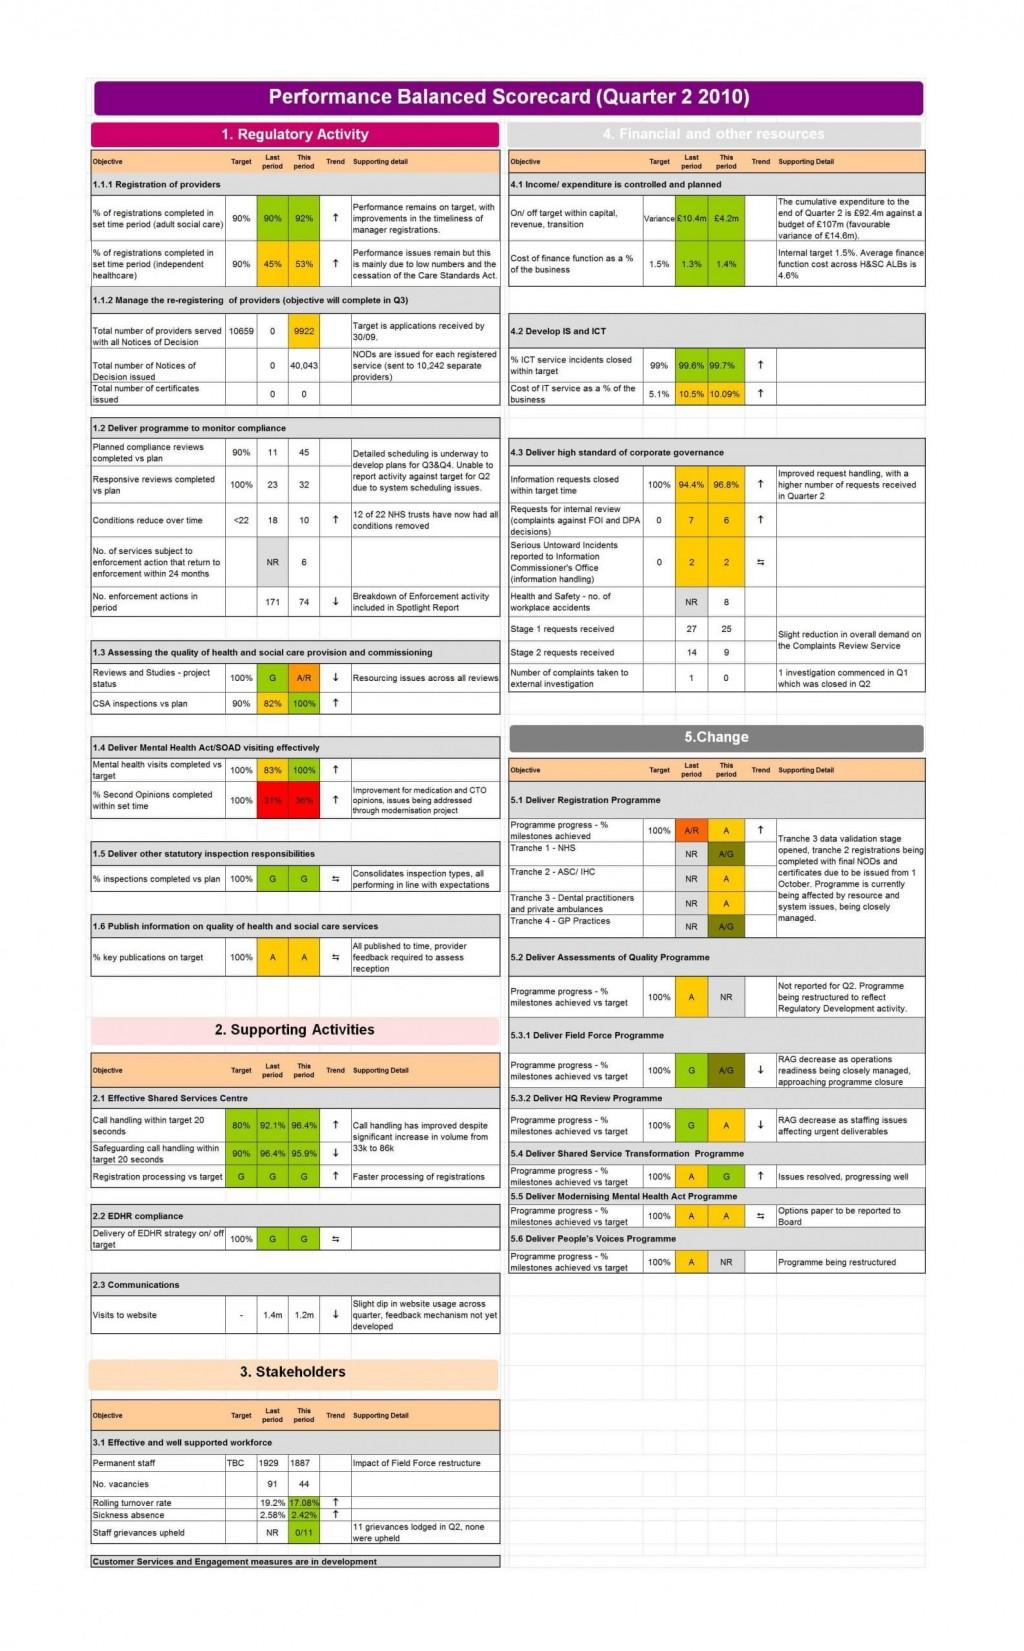 007 Shocking Score Nonprofit Busines Plan Template Highest Clarity Large